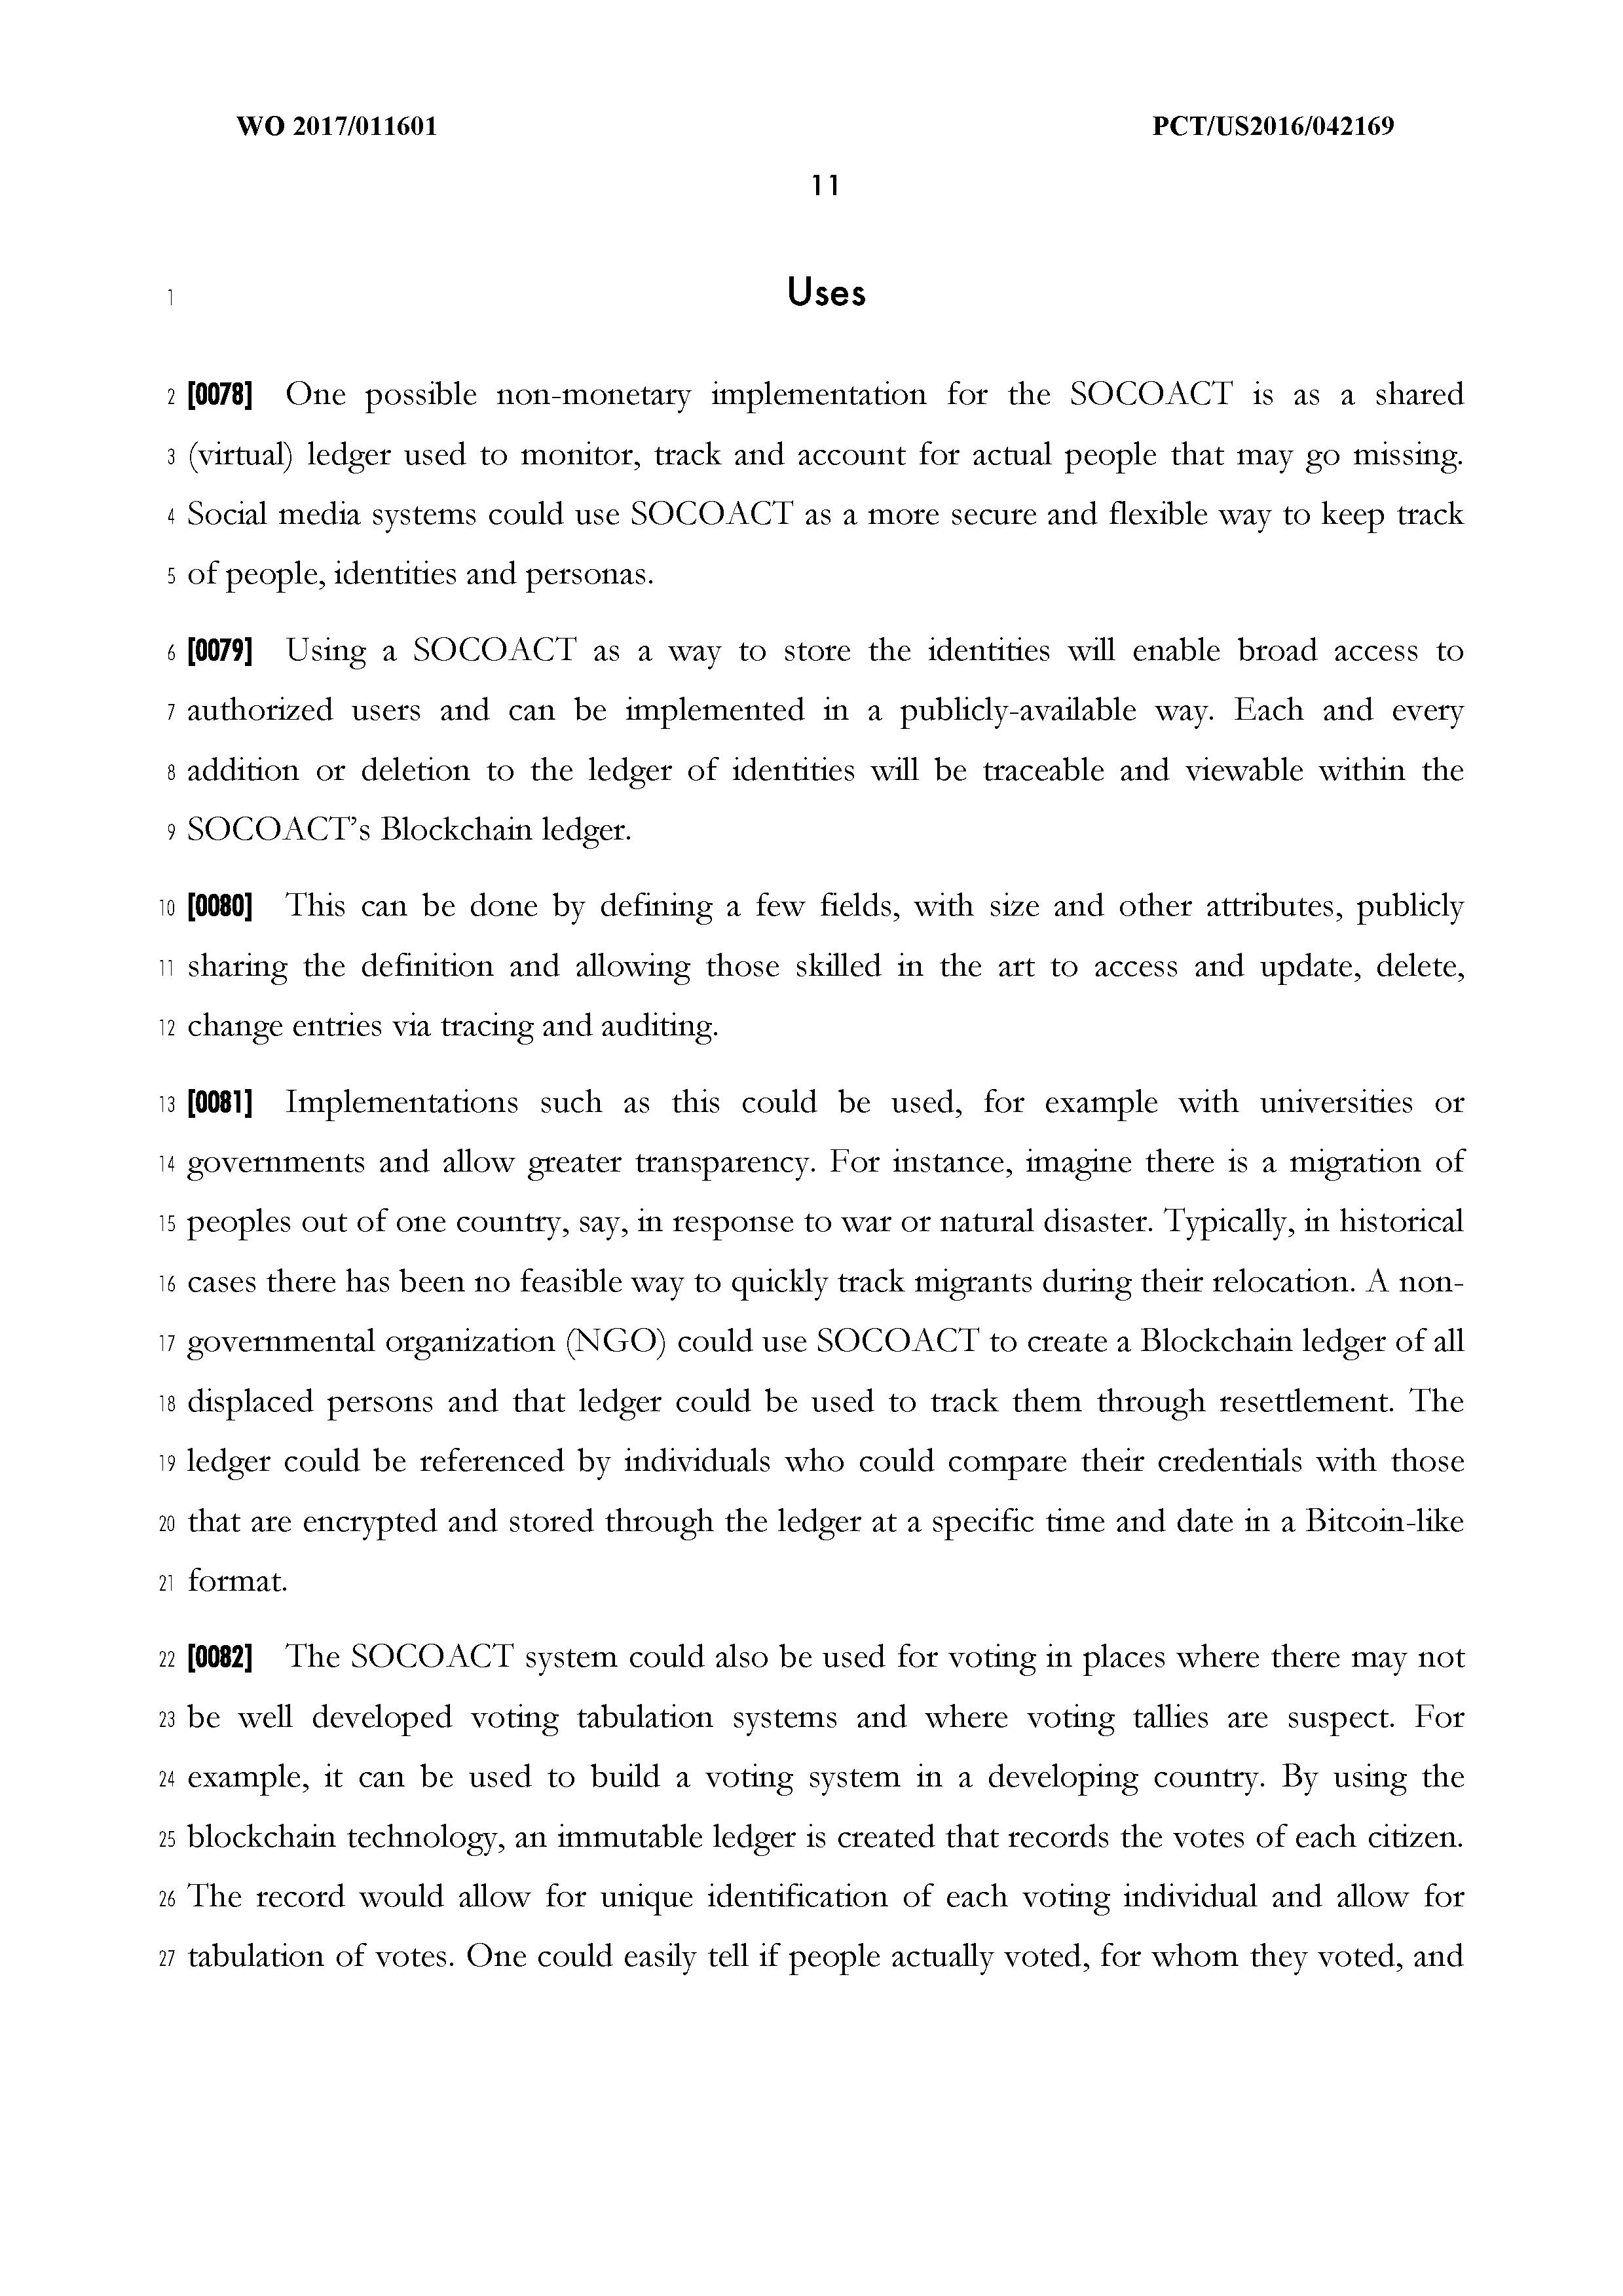 WO 2017/011601 A1 - Computationally Efficient Transfer